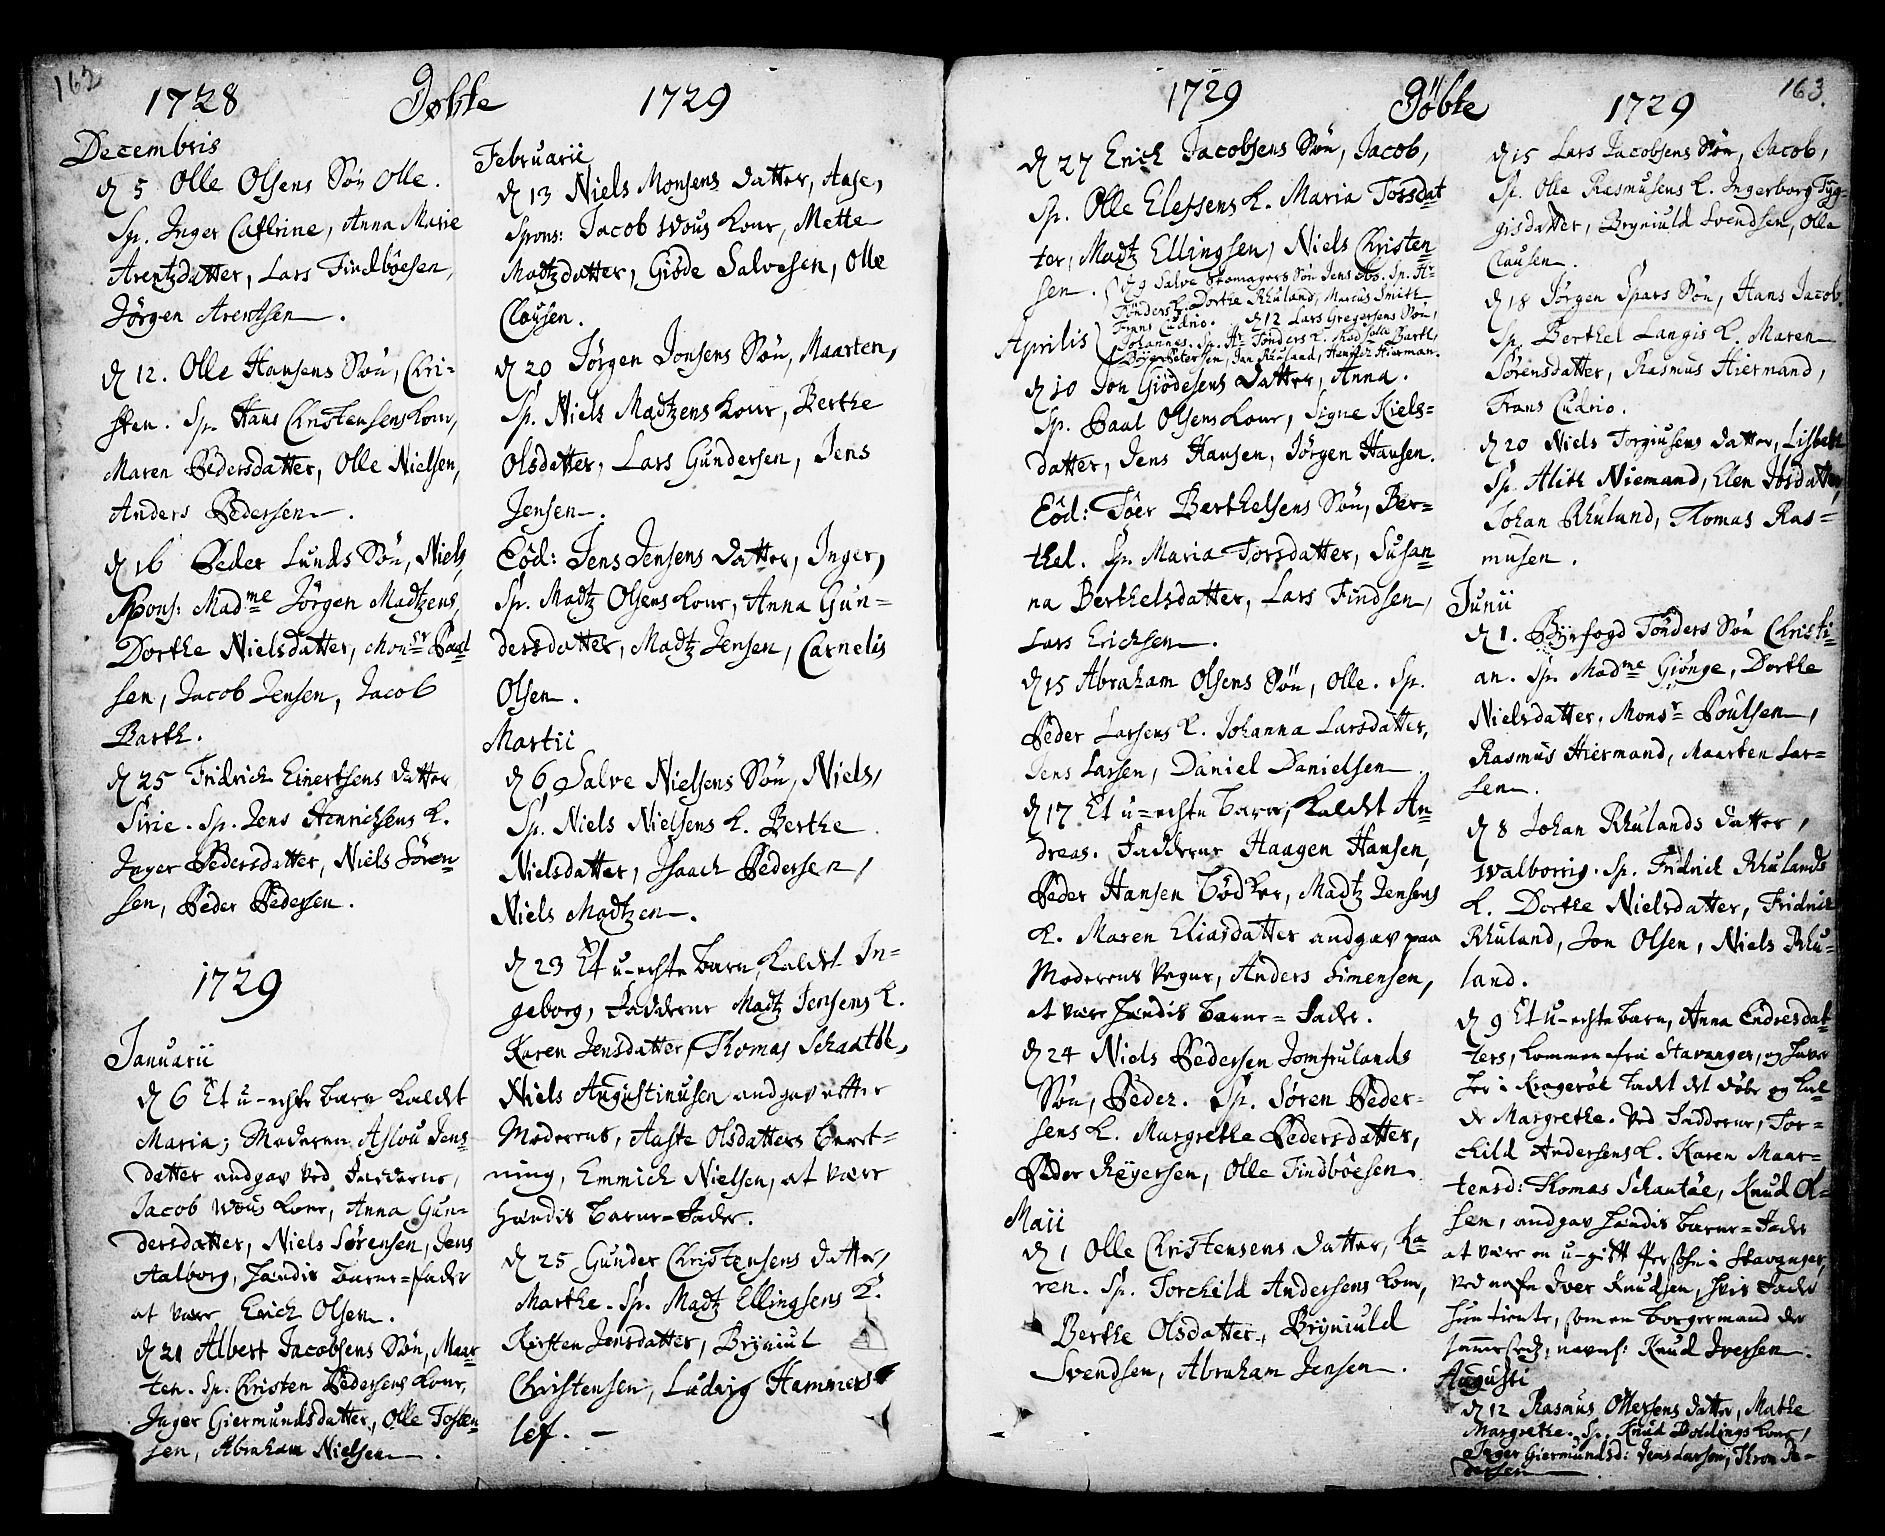 SAKO, Kragerø kirkebøker, F/Fa/L0001: Ministerialbok nr. 1, 1702-1766, s. 162-163